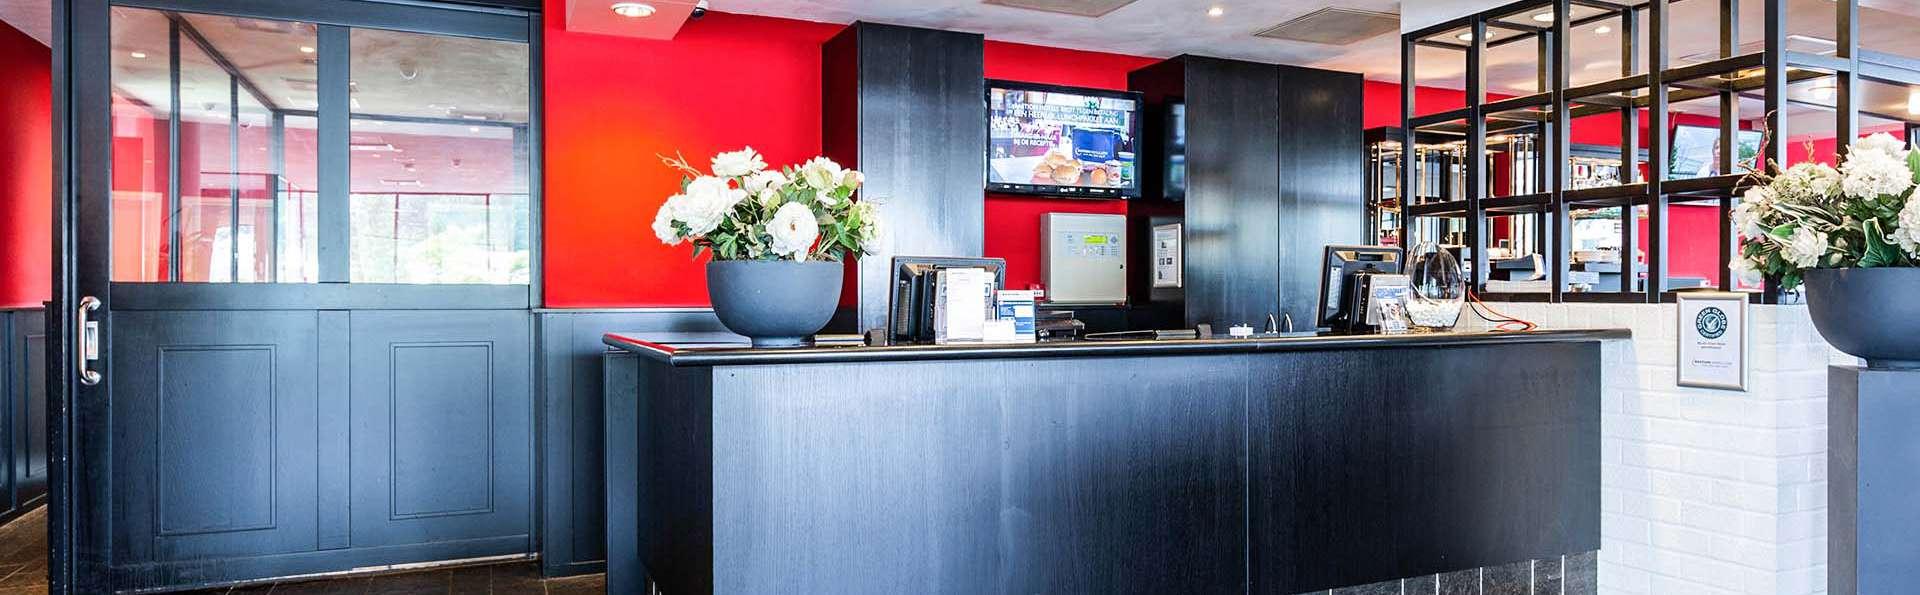 Bastion Hotel Zaandam - EDIT_Bastion_Hotel_Zaandam_Sietsema_Productions_10.jpg